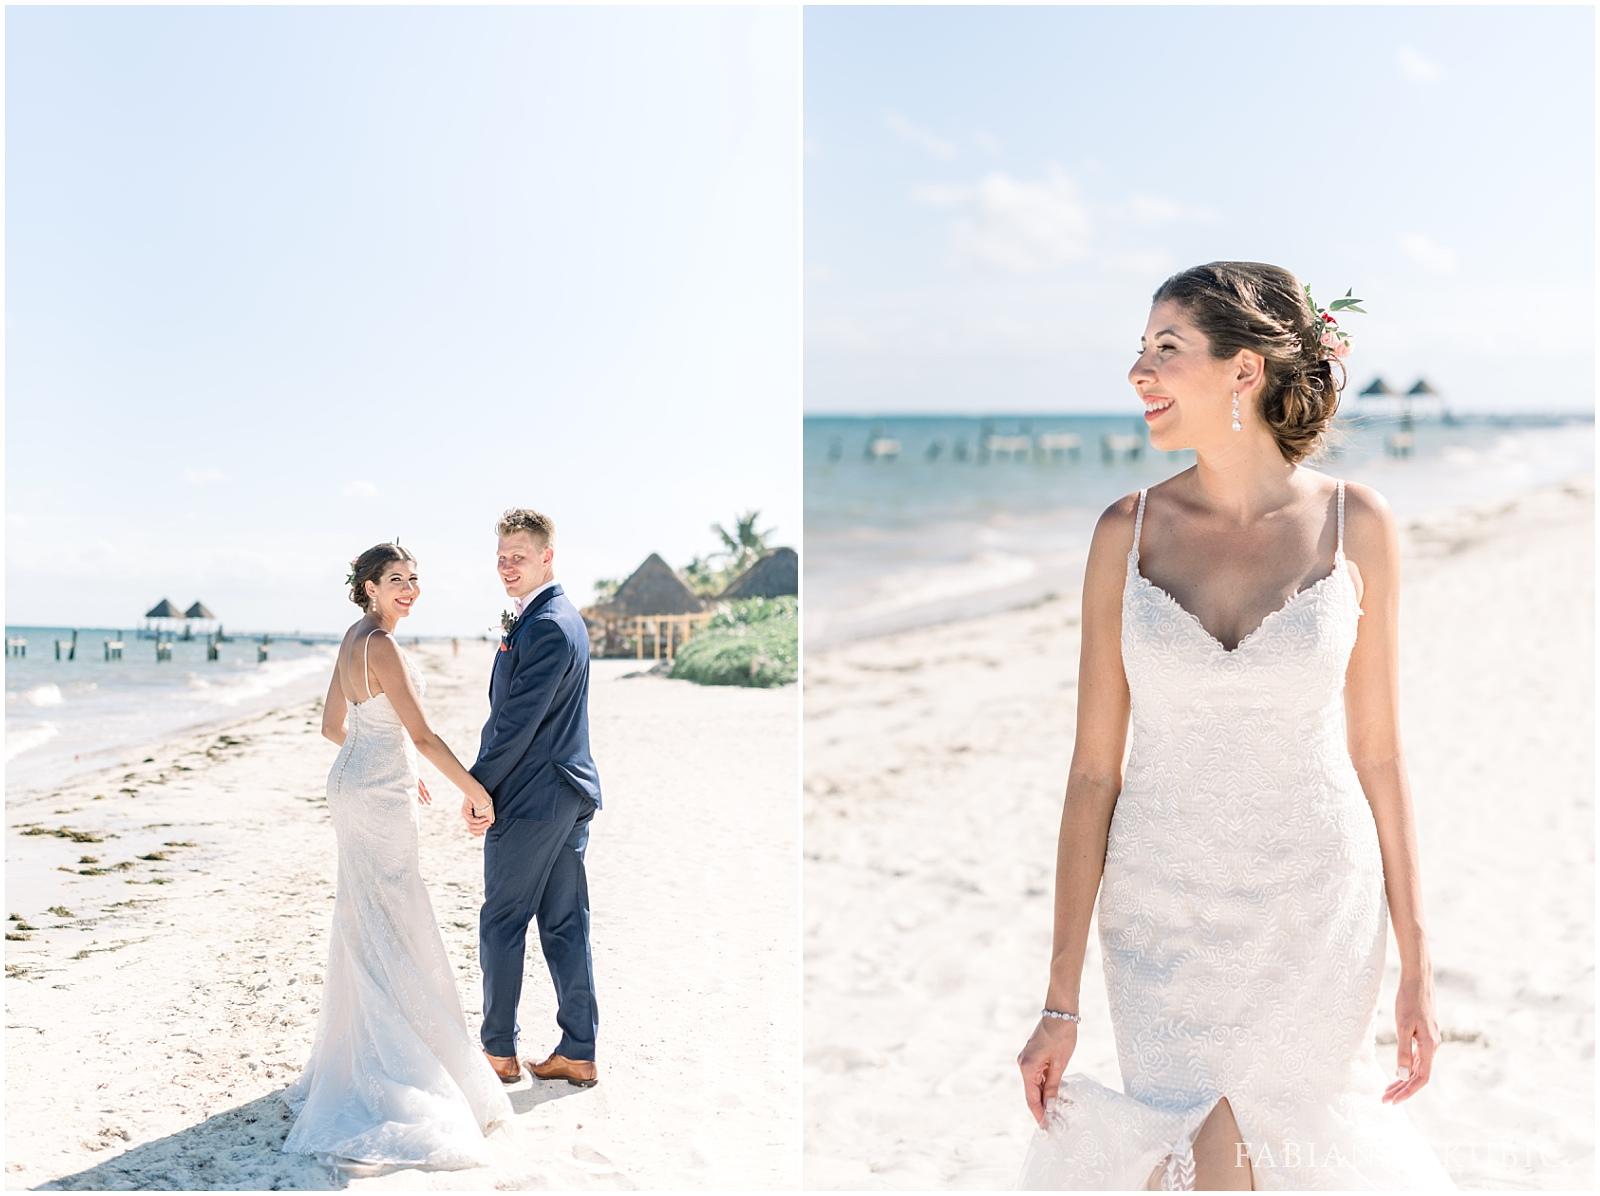 TJ_Now_Sapphire_Riviera_Cancun_Mexico_Wedding_Photos_0205.jpg